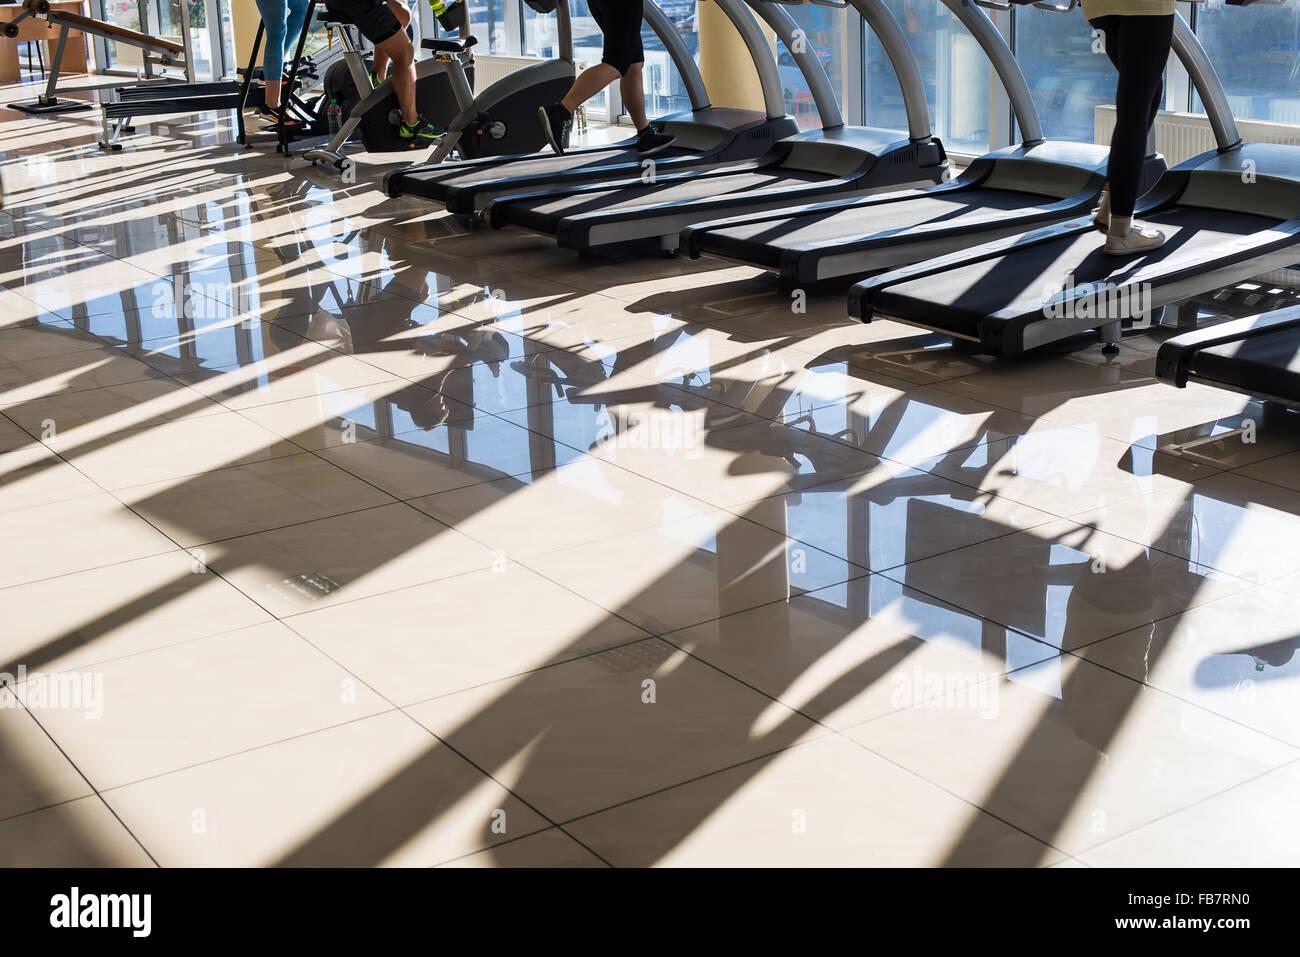 Appareils de sport en salle. Photo Stock